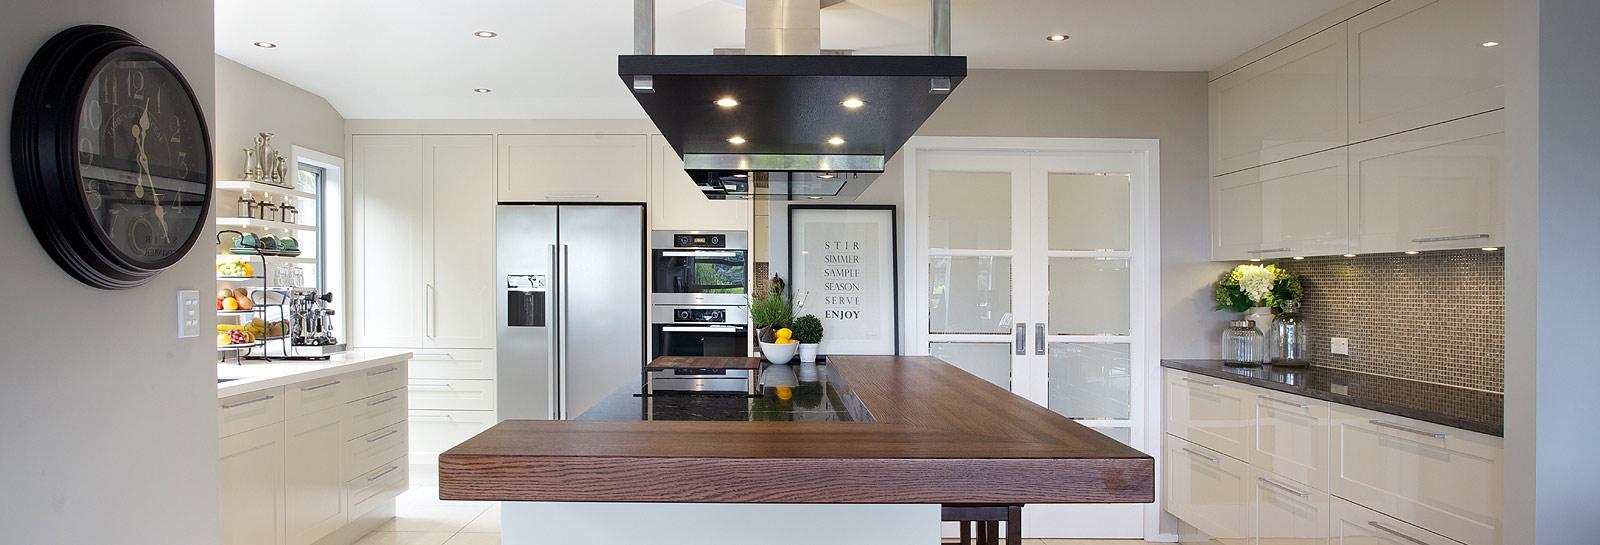 10-KitchenArch_CockleBay